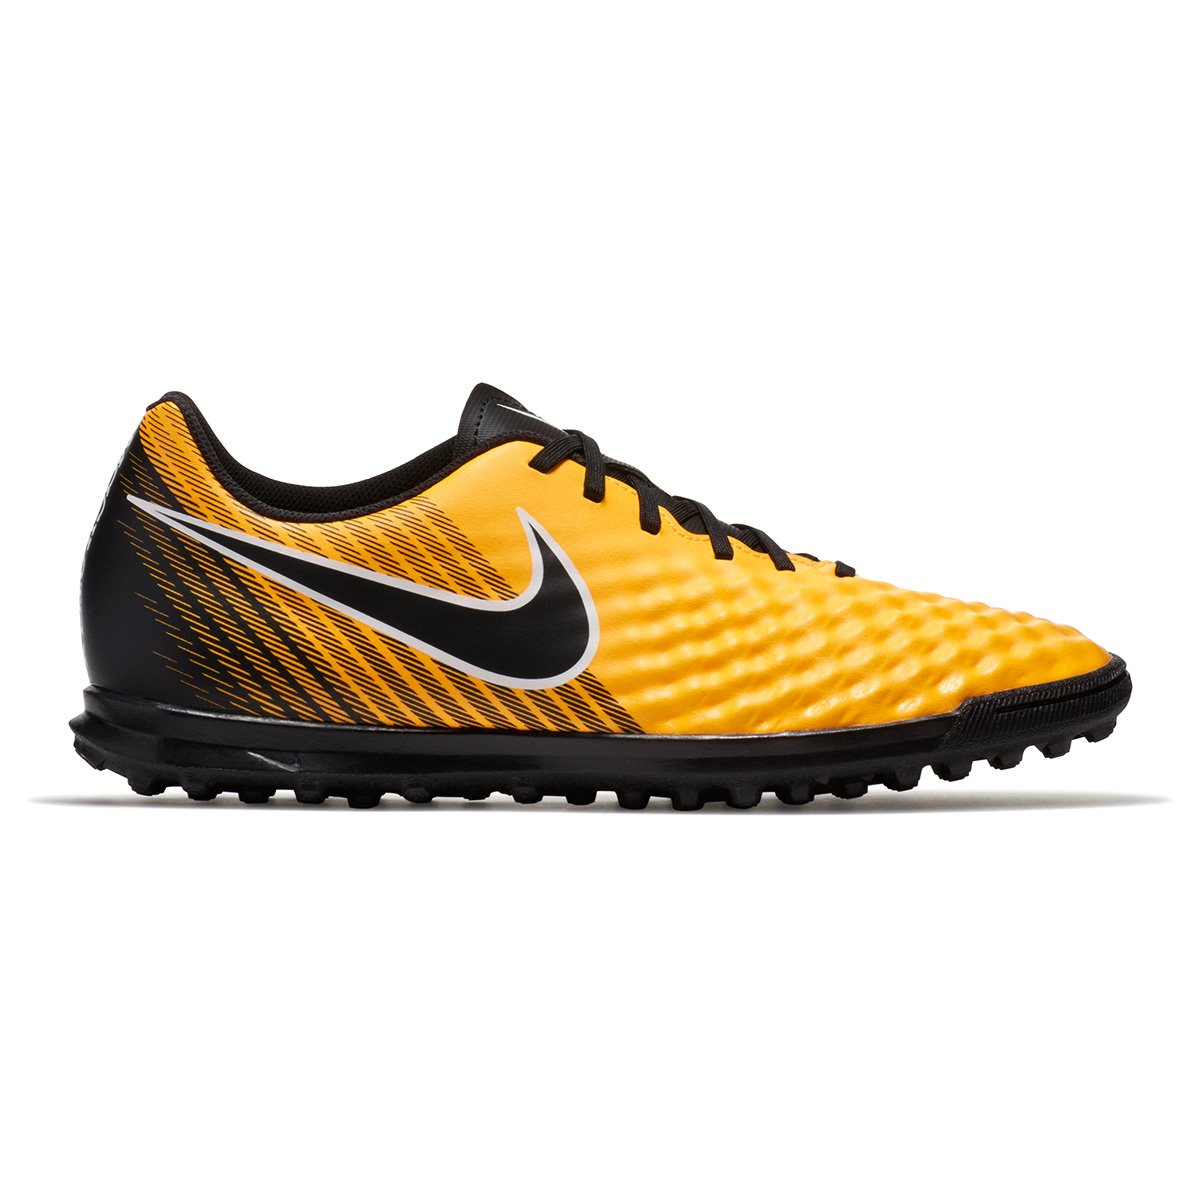 009ef575c6 Chuteira Society Nike Magista Ola II TF - Compre Agora